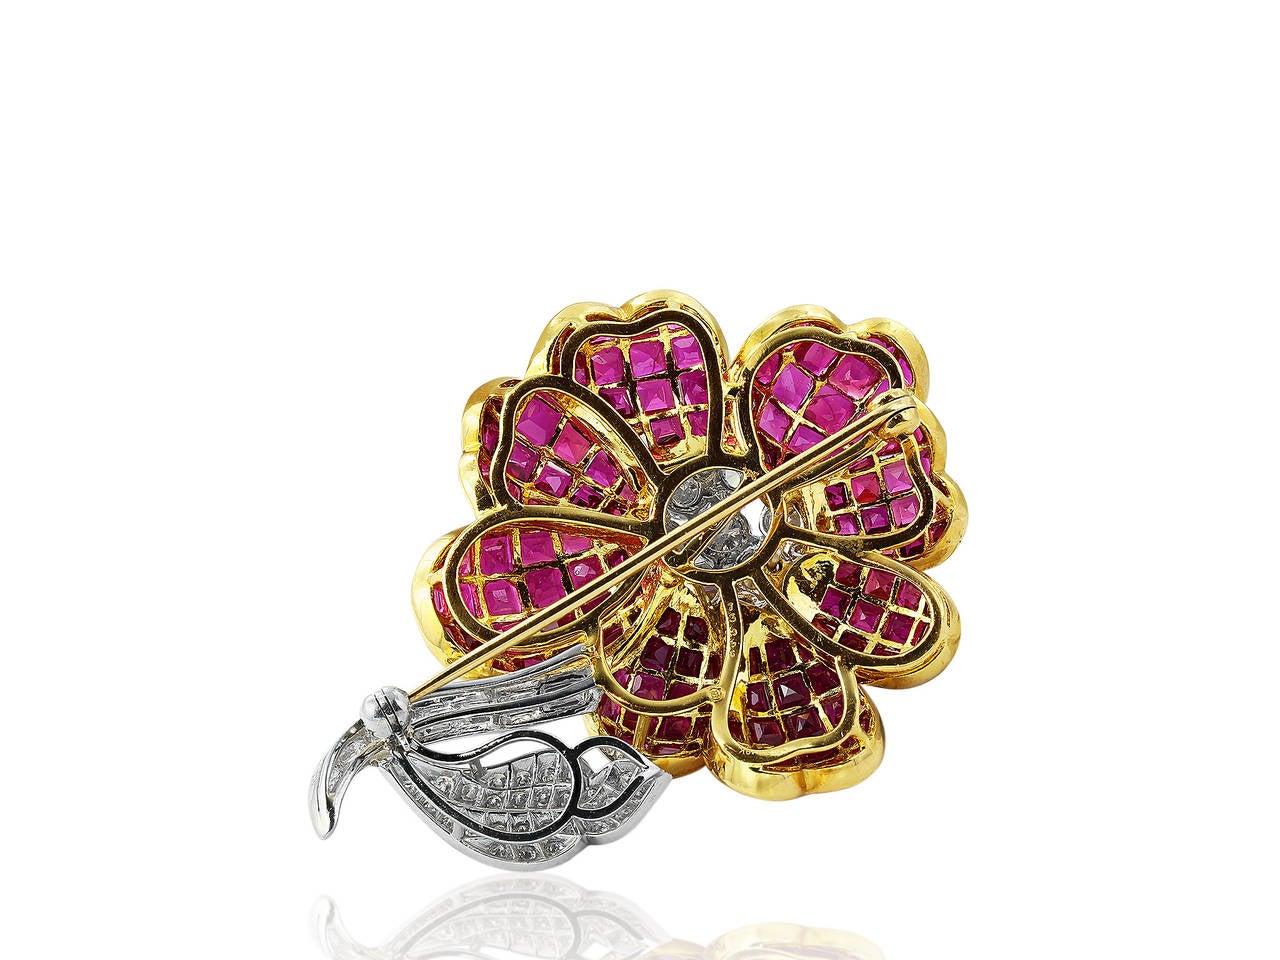 Contemporary Oscar Heyman Ruby and Diamond Brooch For Sale